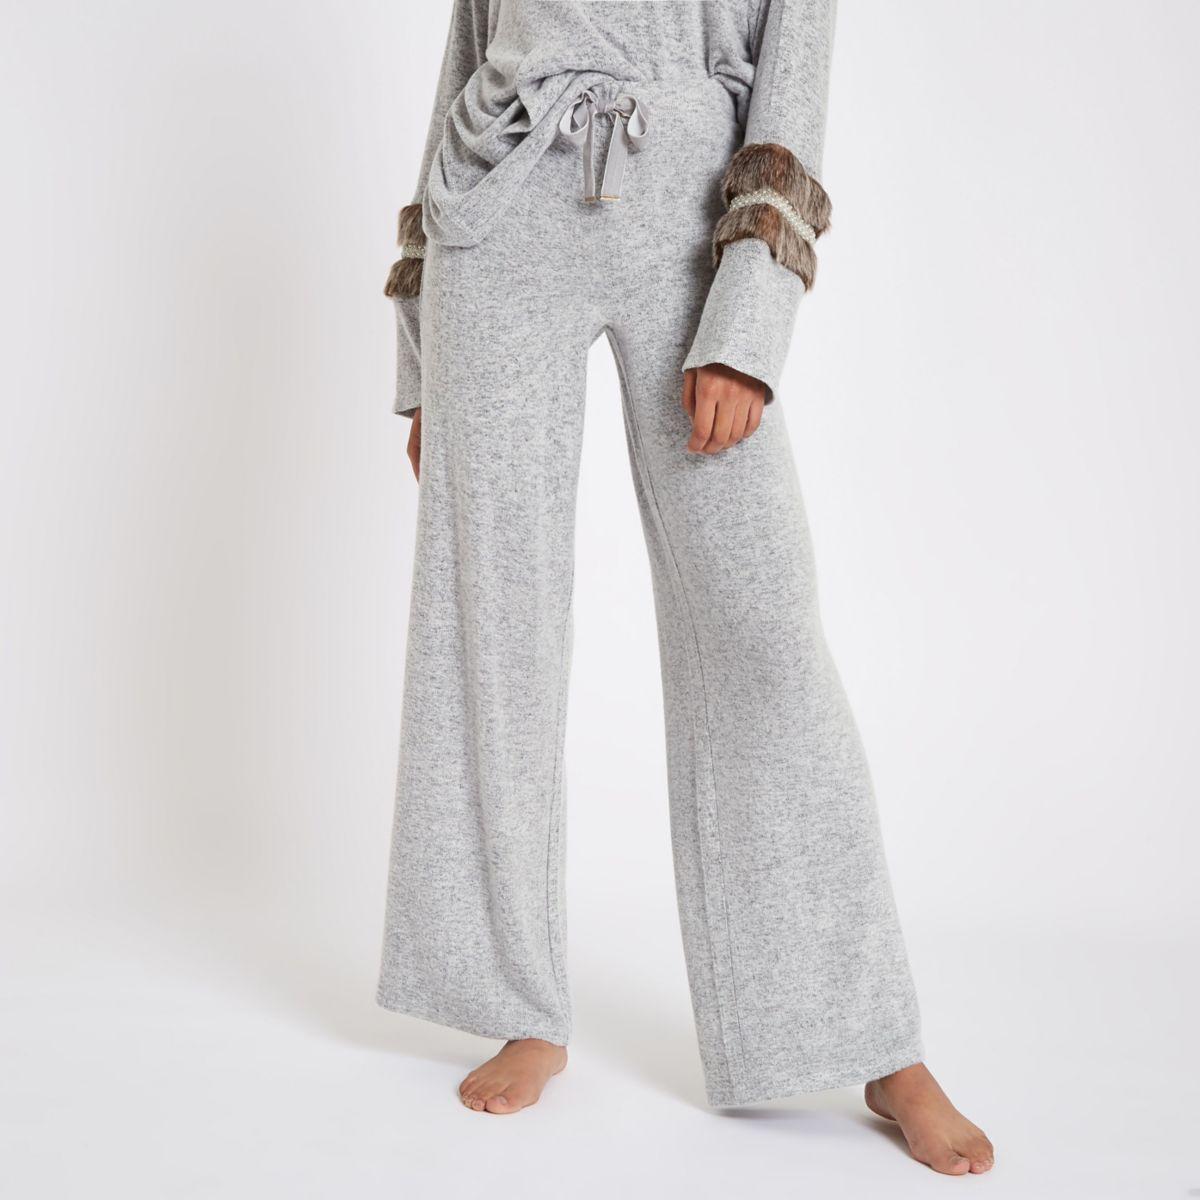 Grey soft jersey wide leg trousers